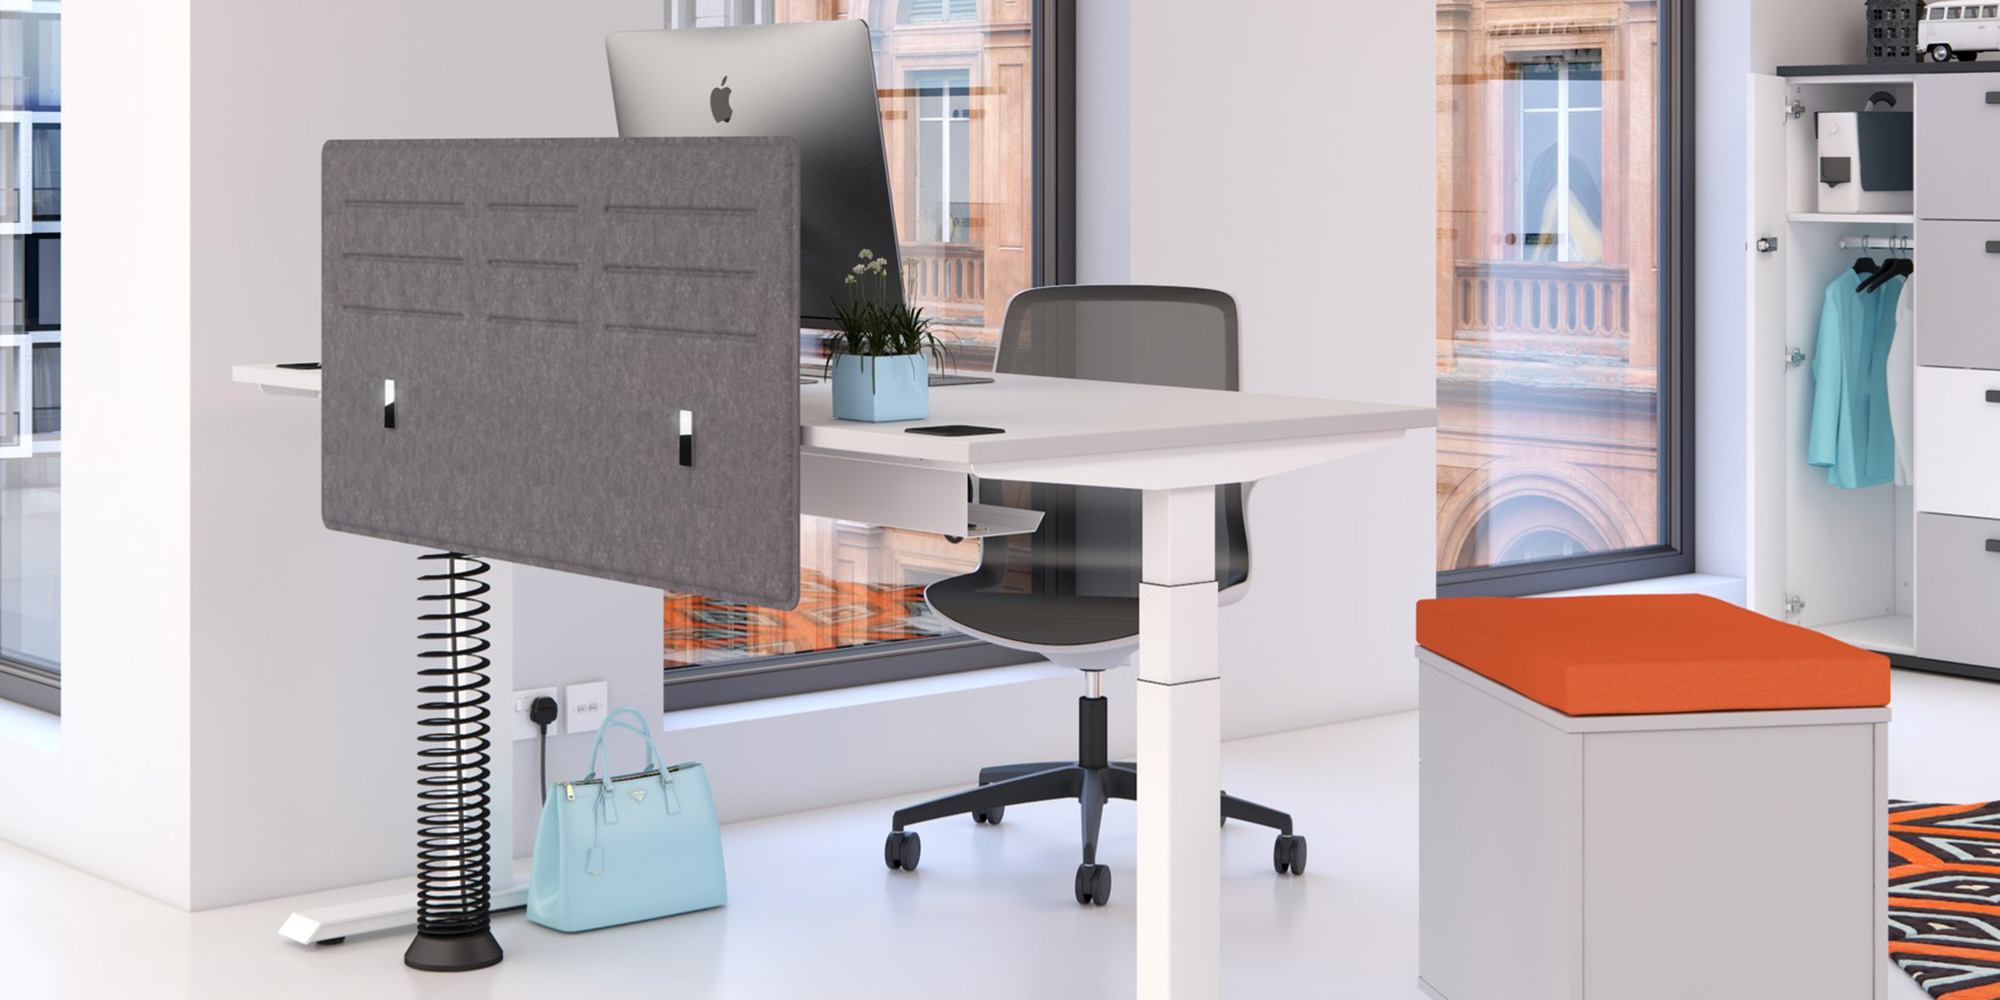 Blade Desk Mounted Screens Roomset